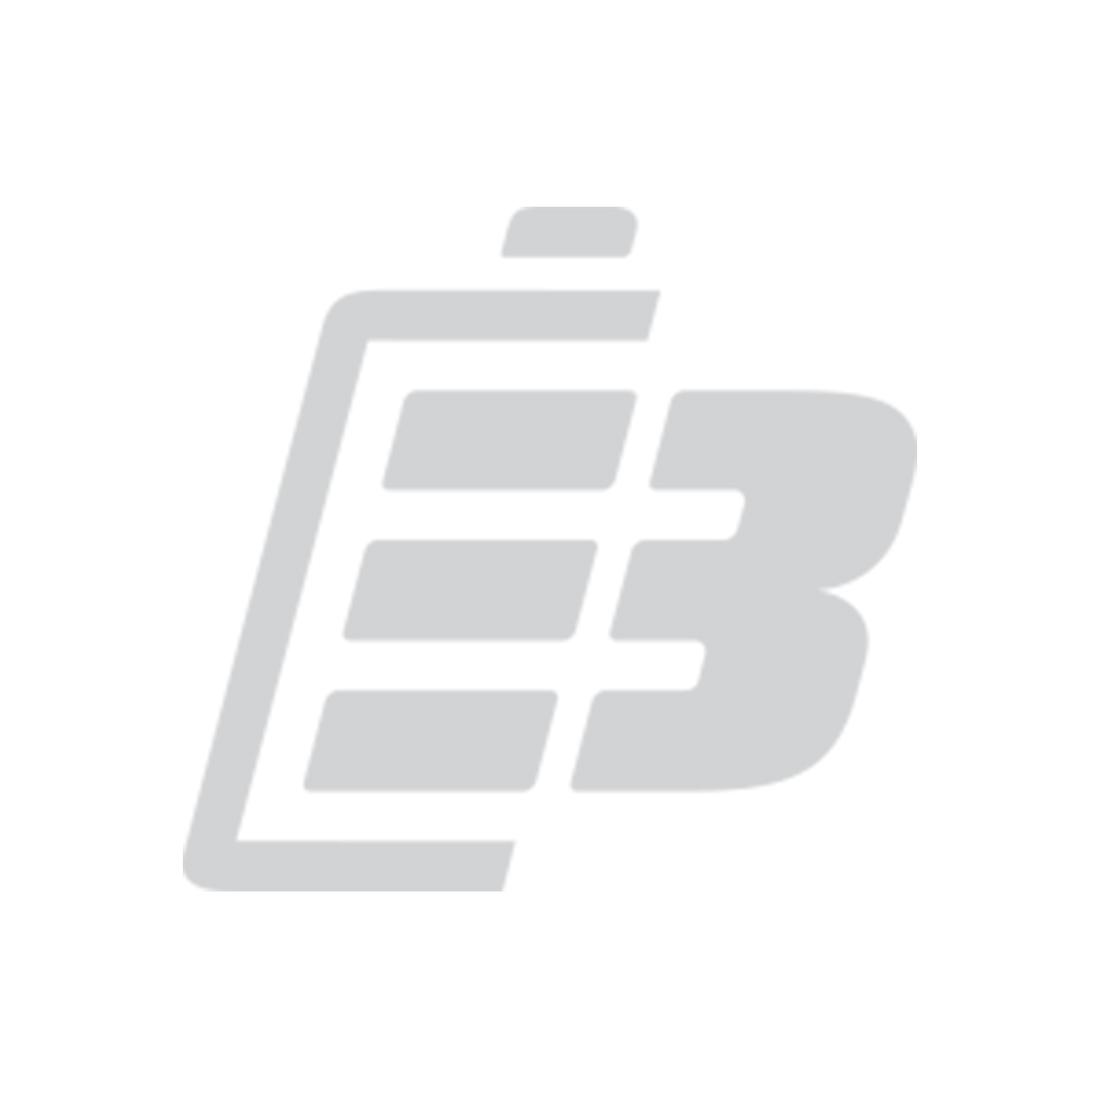 Camera battery Casio NP-70_1